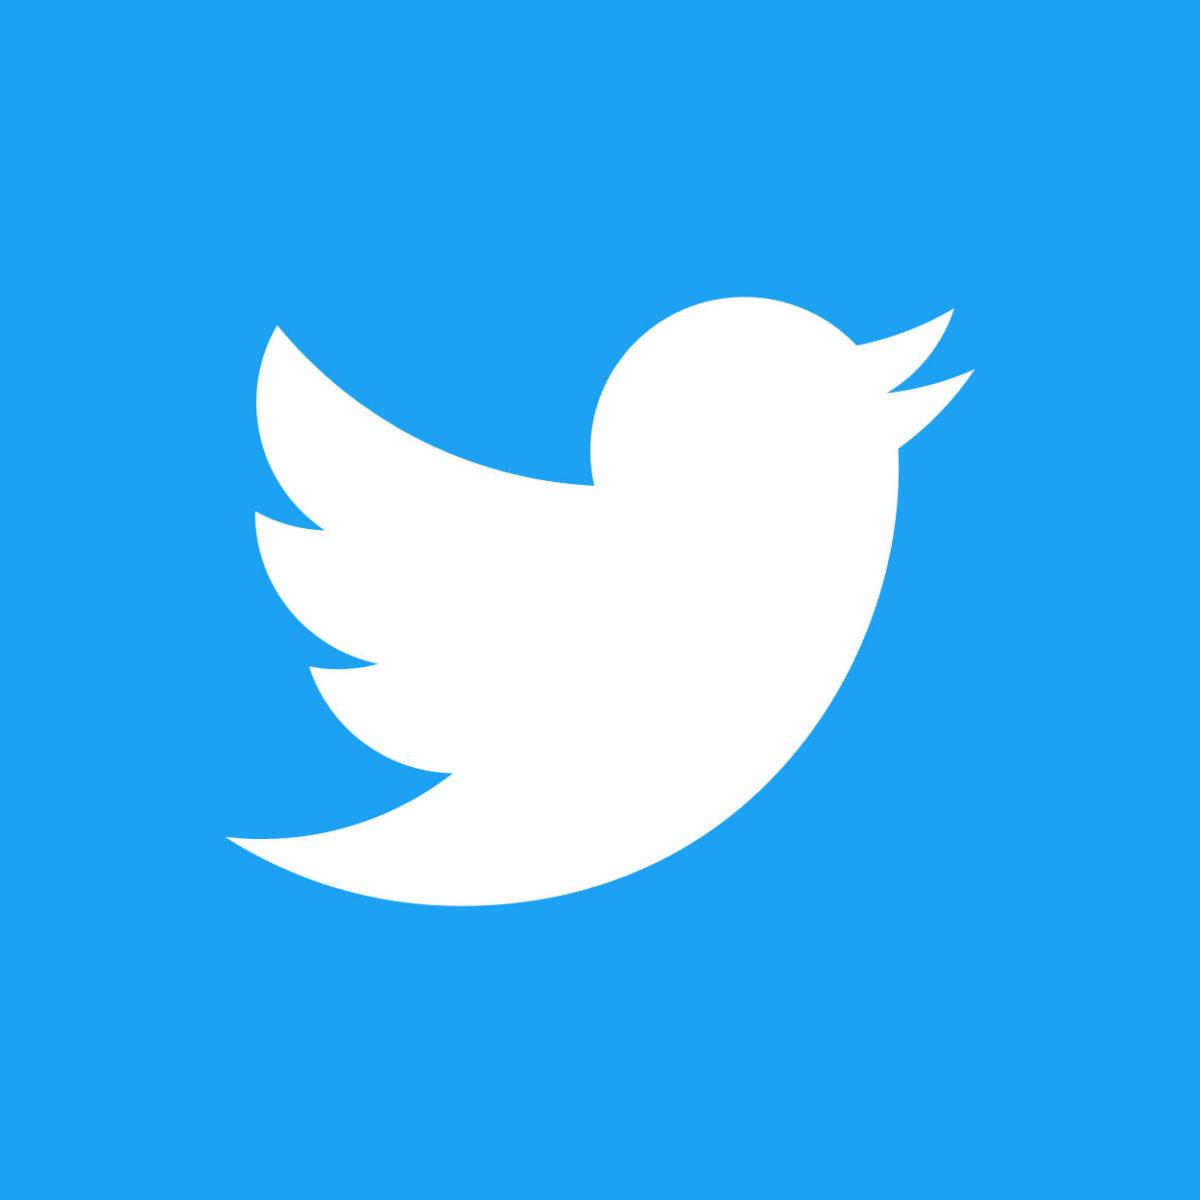 twitter-logo-1200x1200-1 Actualités